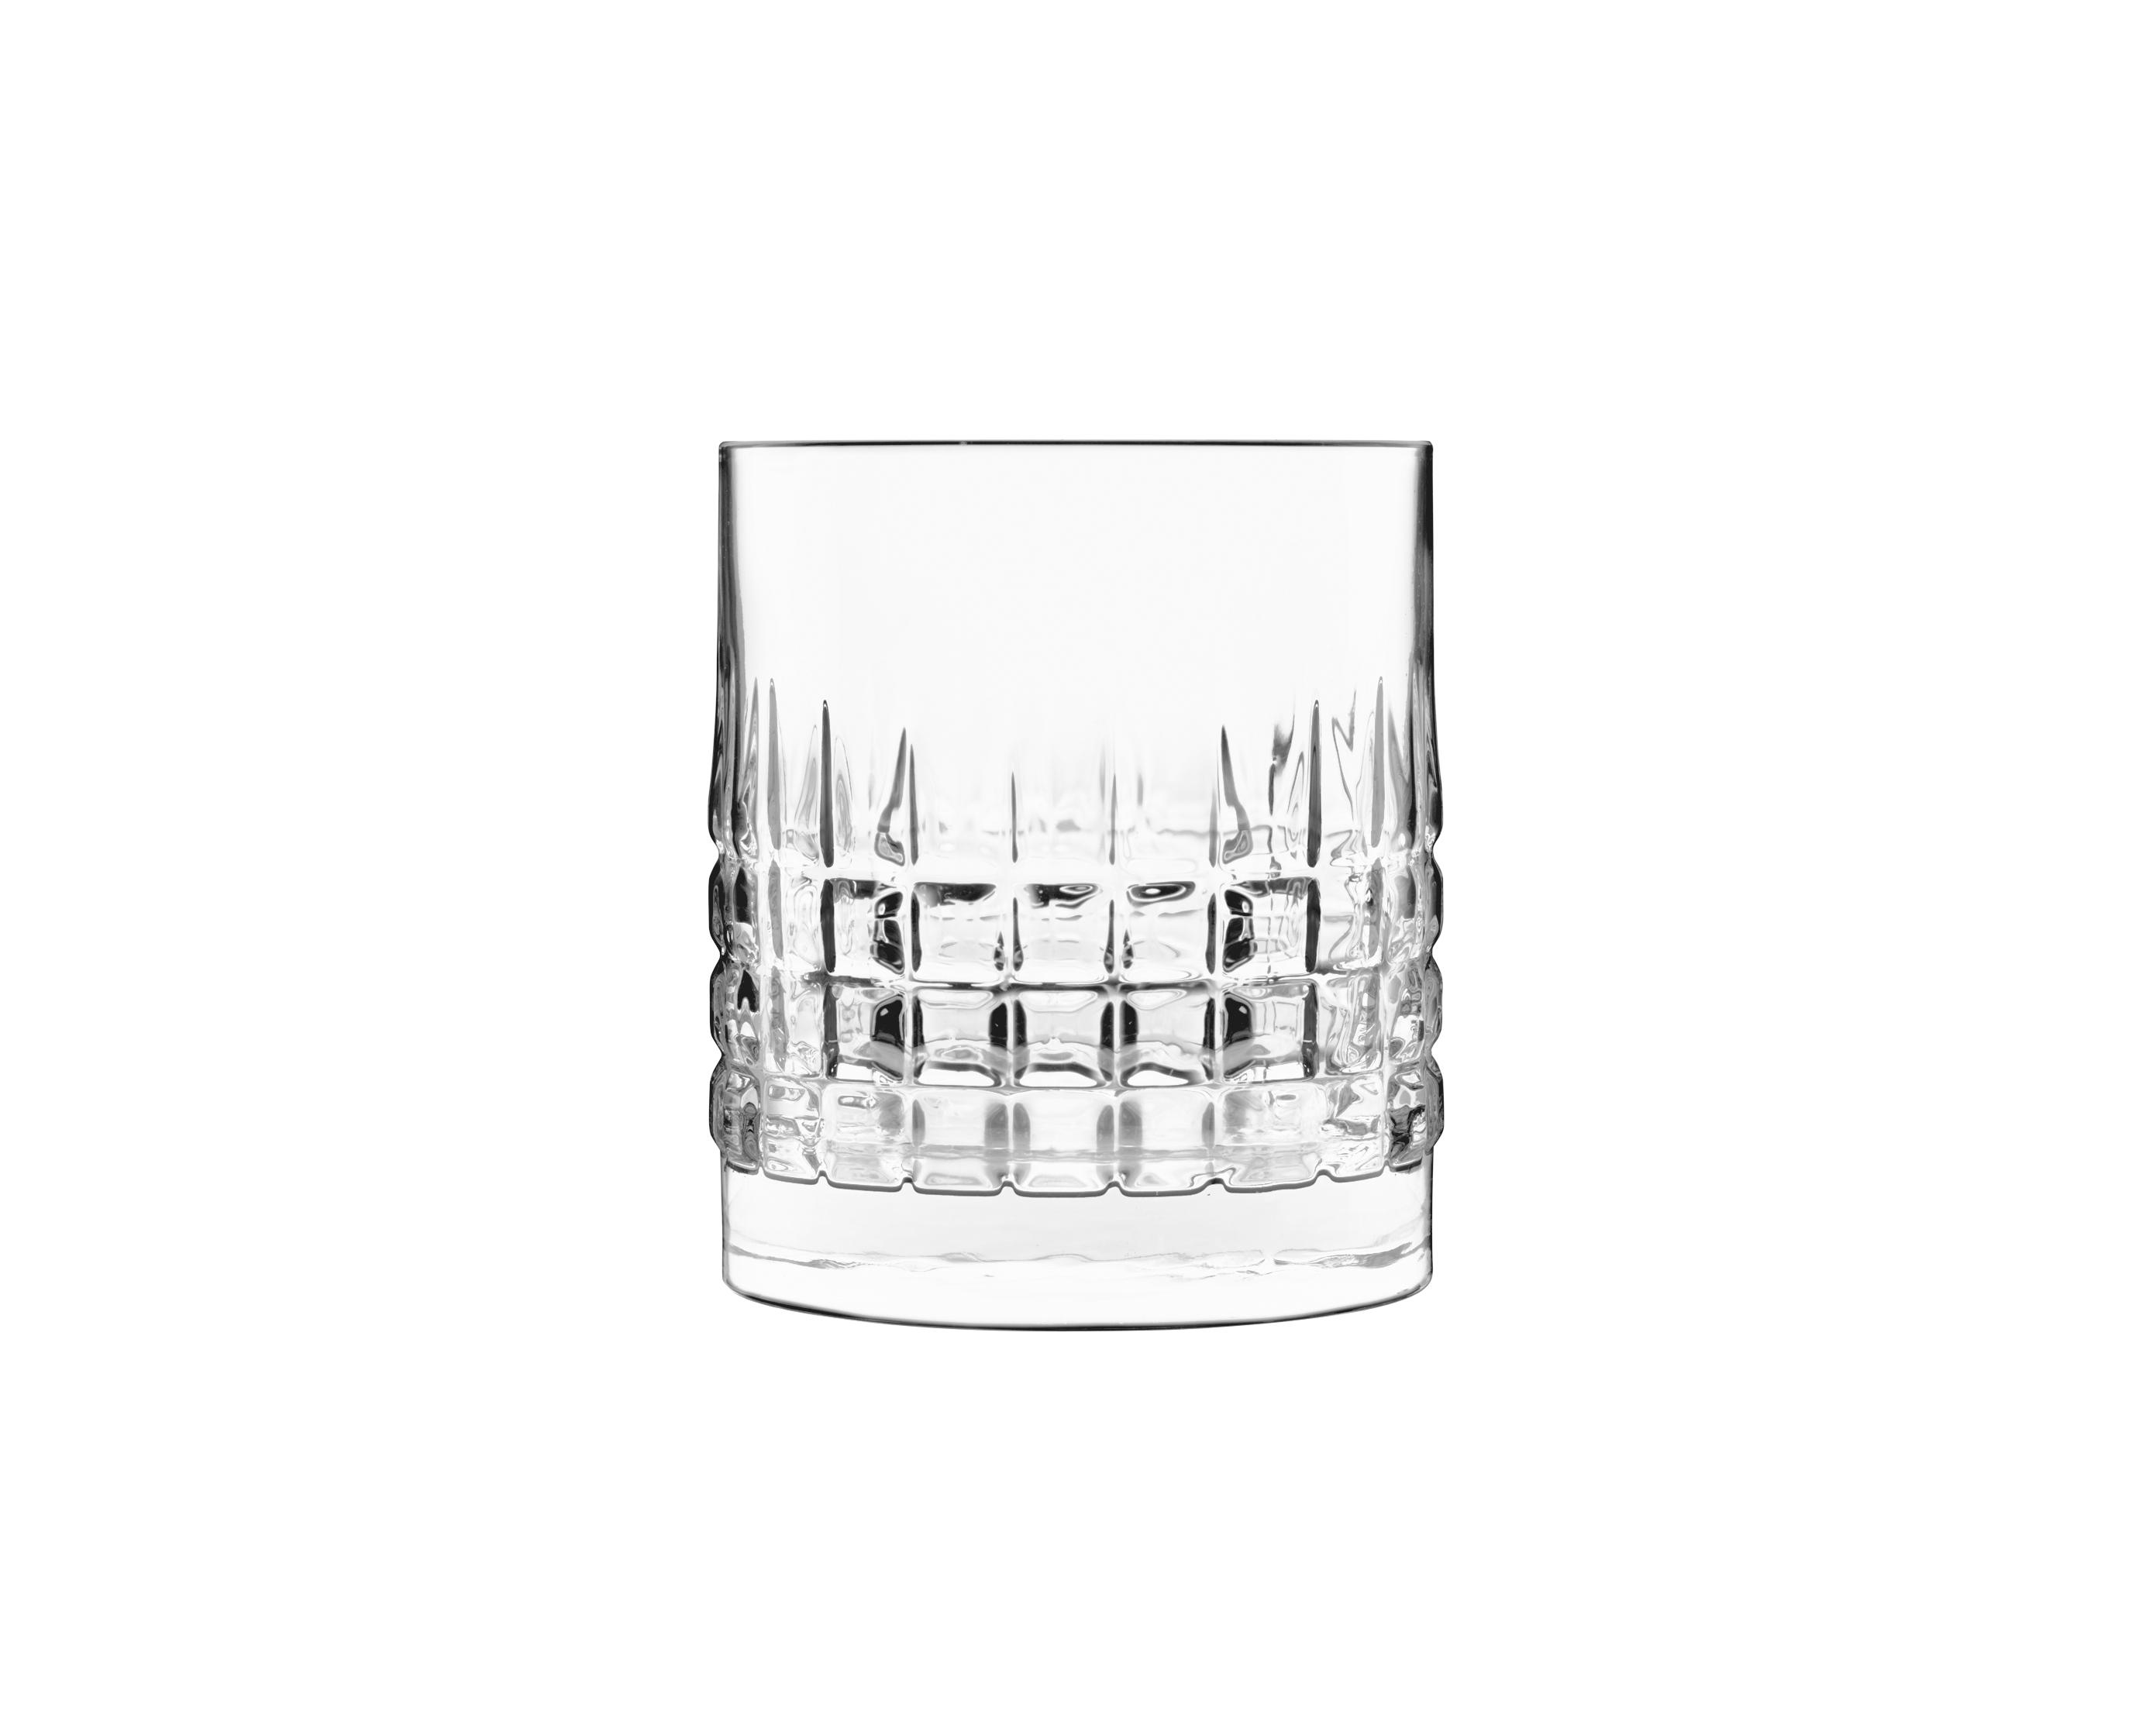 Luigi Bormioli - Mixology Charme Whisky Lowball Glass 38 cl - 4 pack (12328-02)